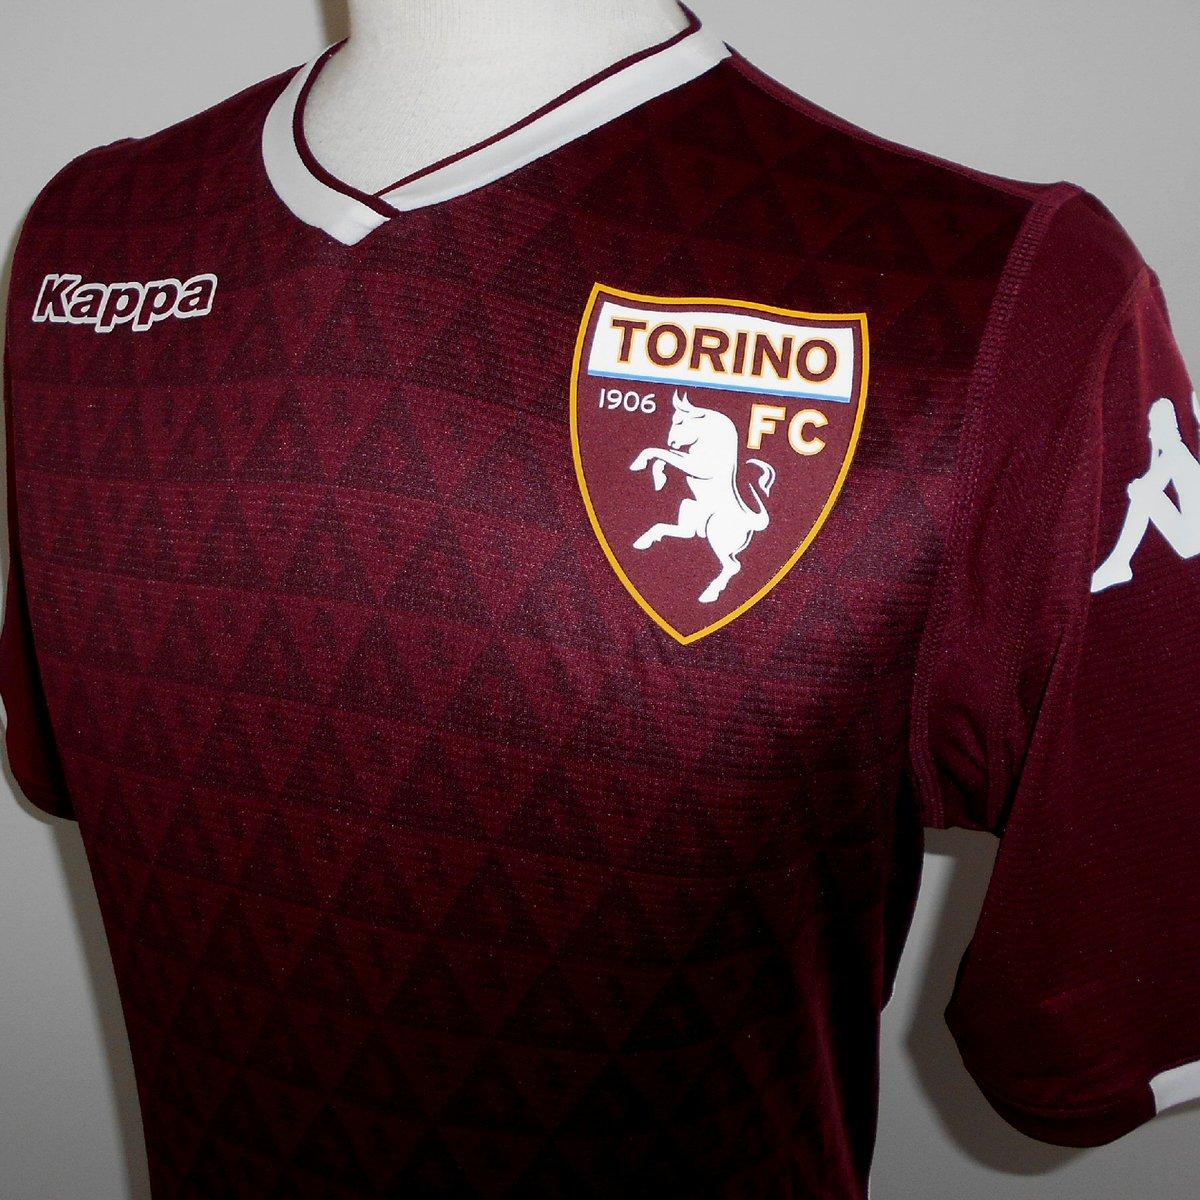 ... new Torino FC official Kappa home football shirt for the 2018-2019  season in stock.  http   footballfanuk.com Club-Teams-ITALY-C141846.aspx sid 3260 … 2e07a68f5